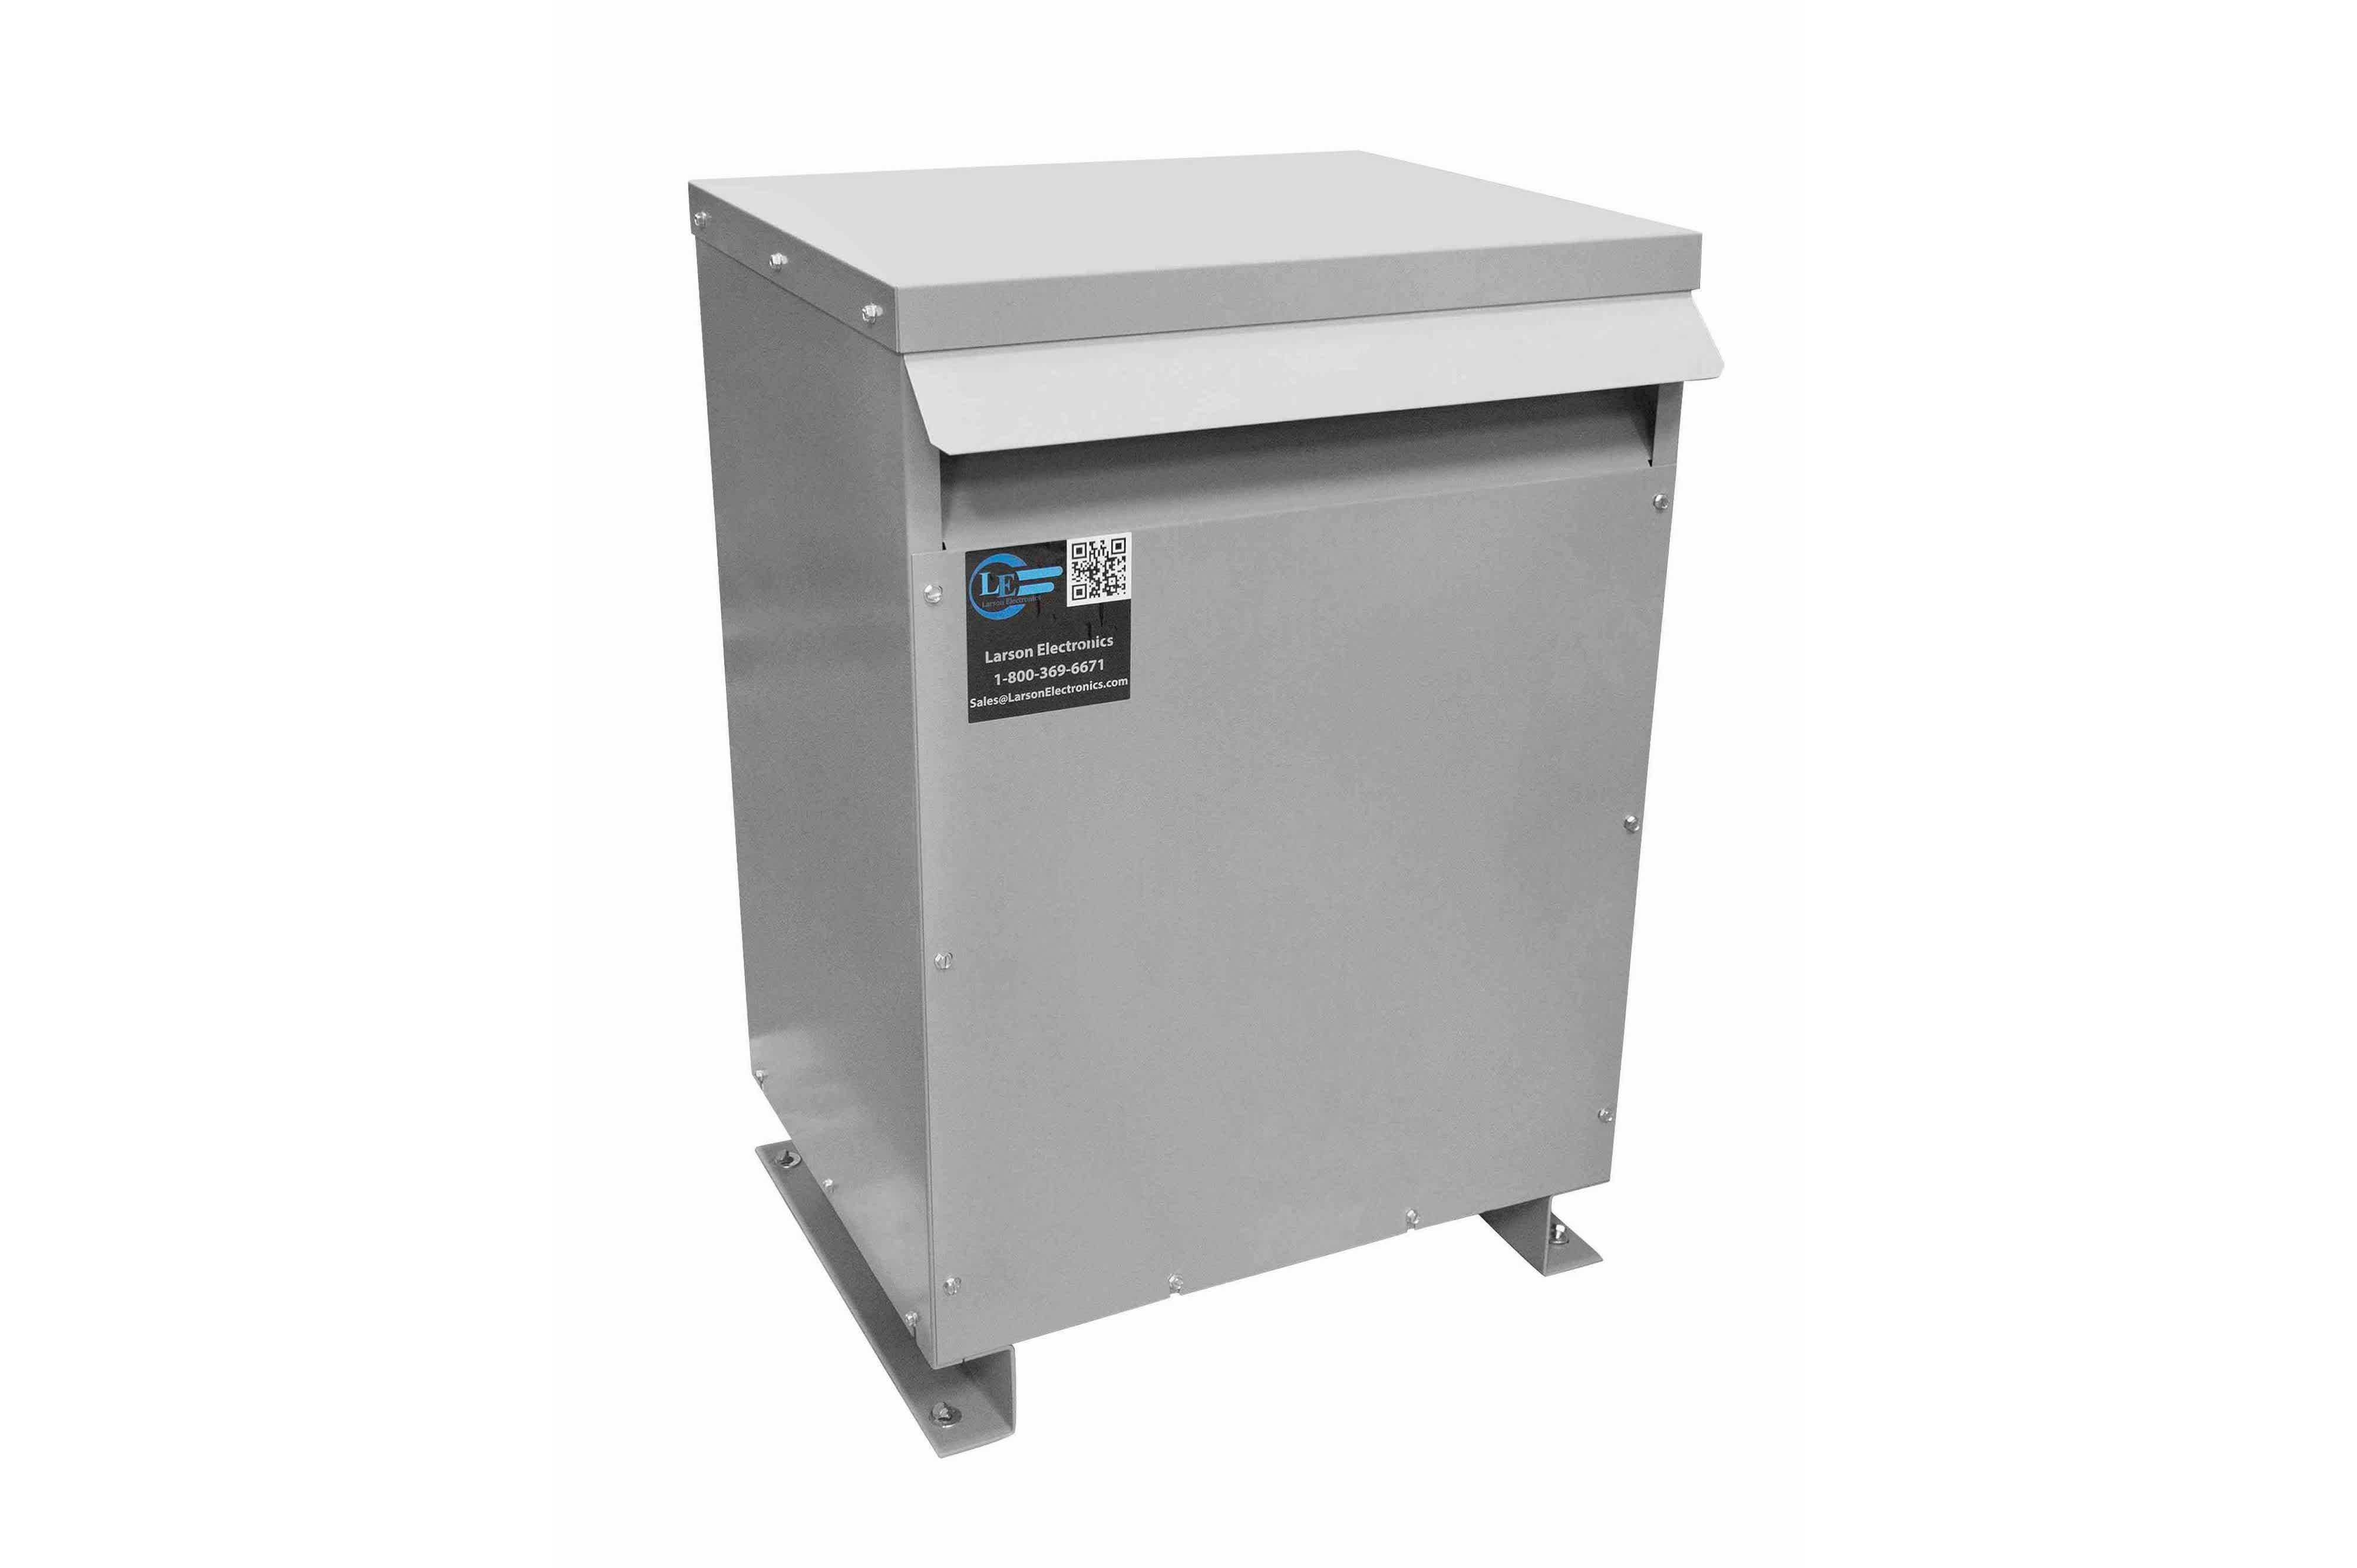 700 kVA 3PH DOE Transformer, 208V Delta Primary, 208Y/120 Wye-N Secondary, N3R, Ventilated, 60 Hz